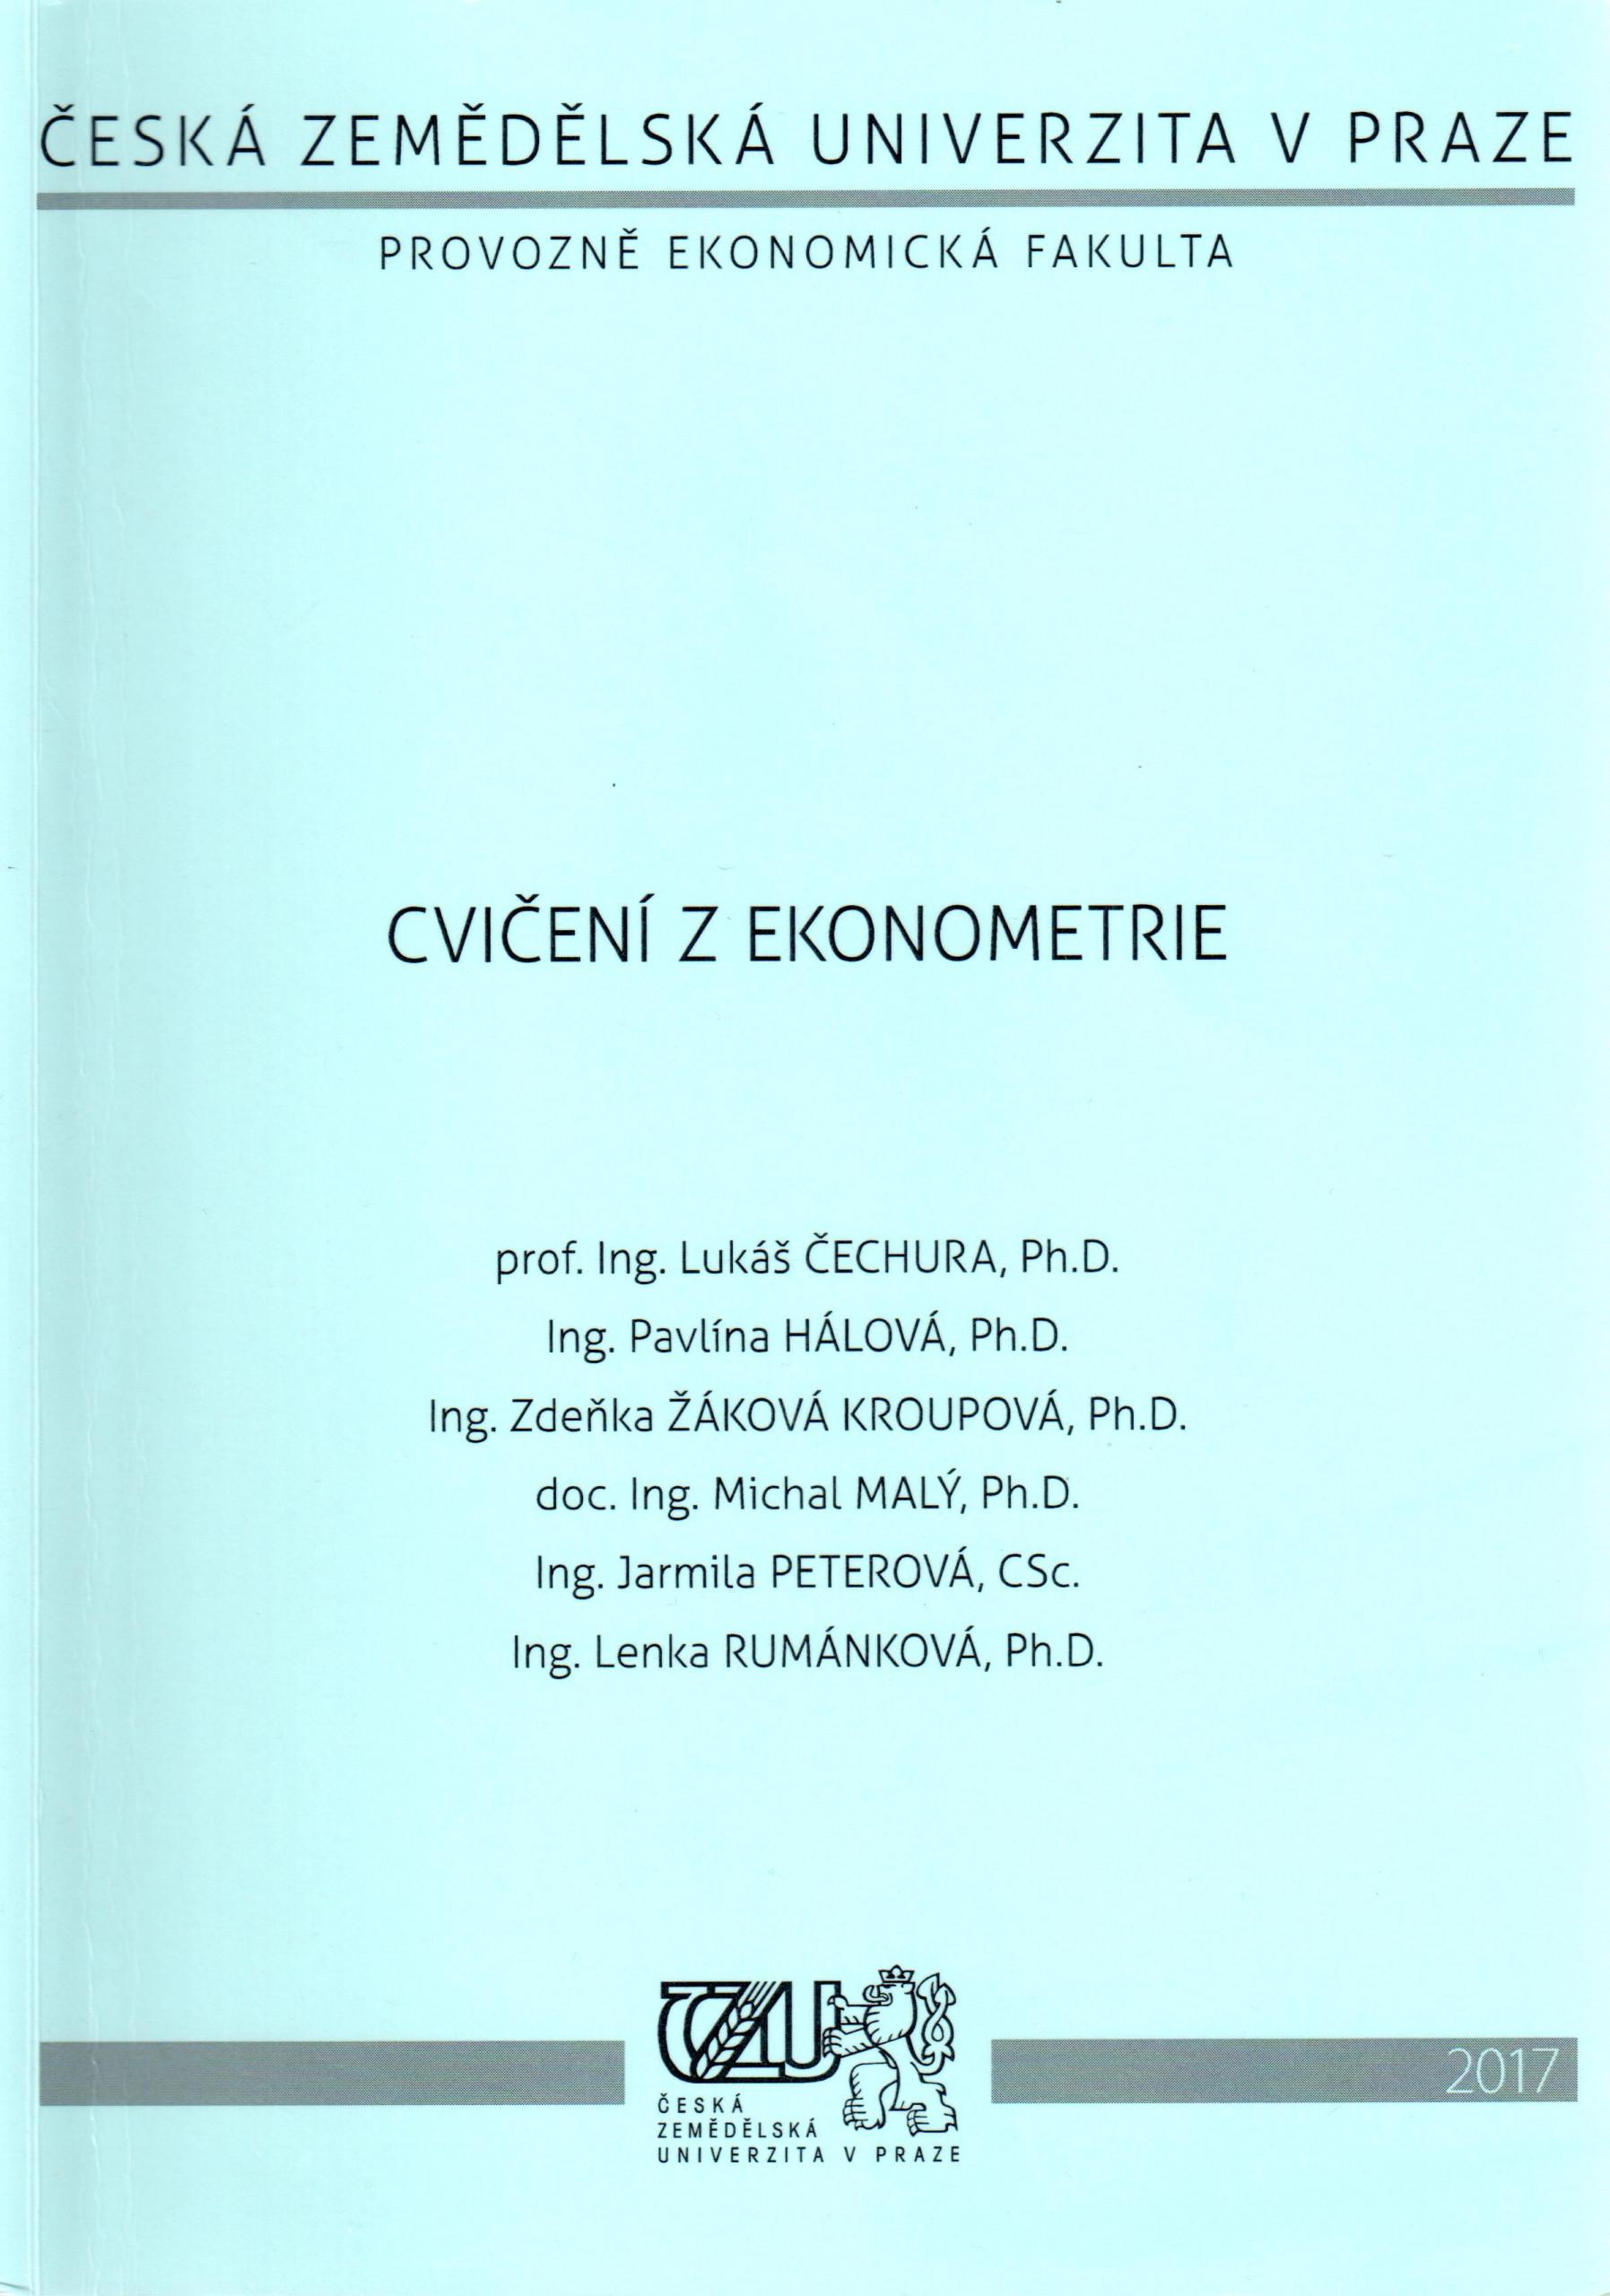 Cvičení z ekonometrie - Náhled učebnice